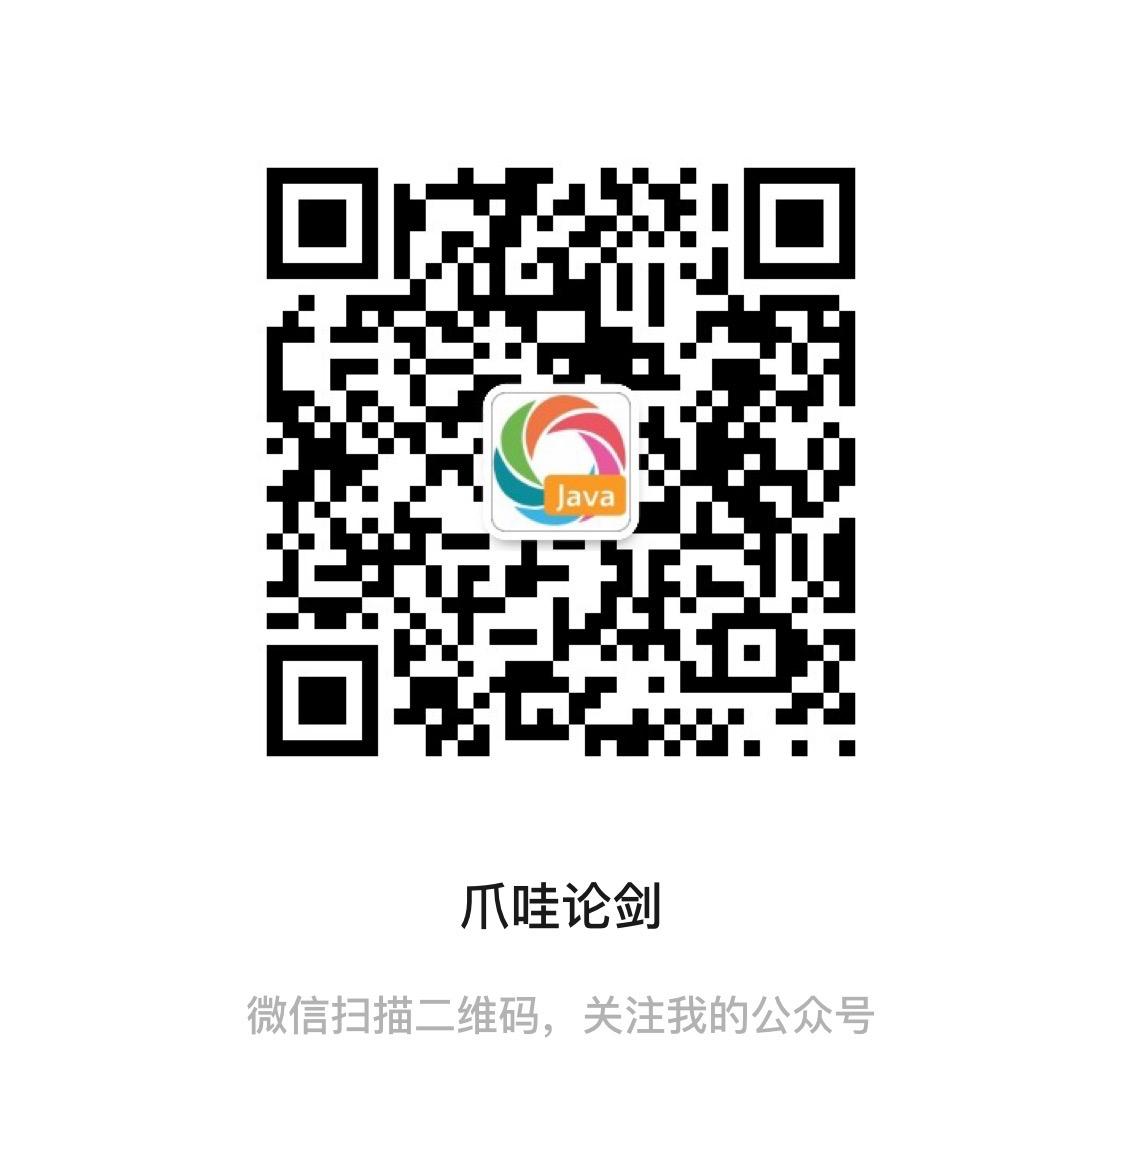 uXD9A0.jpg